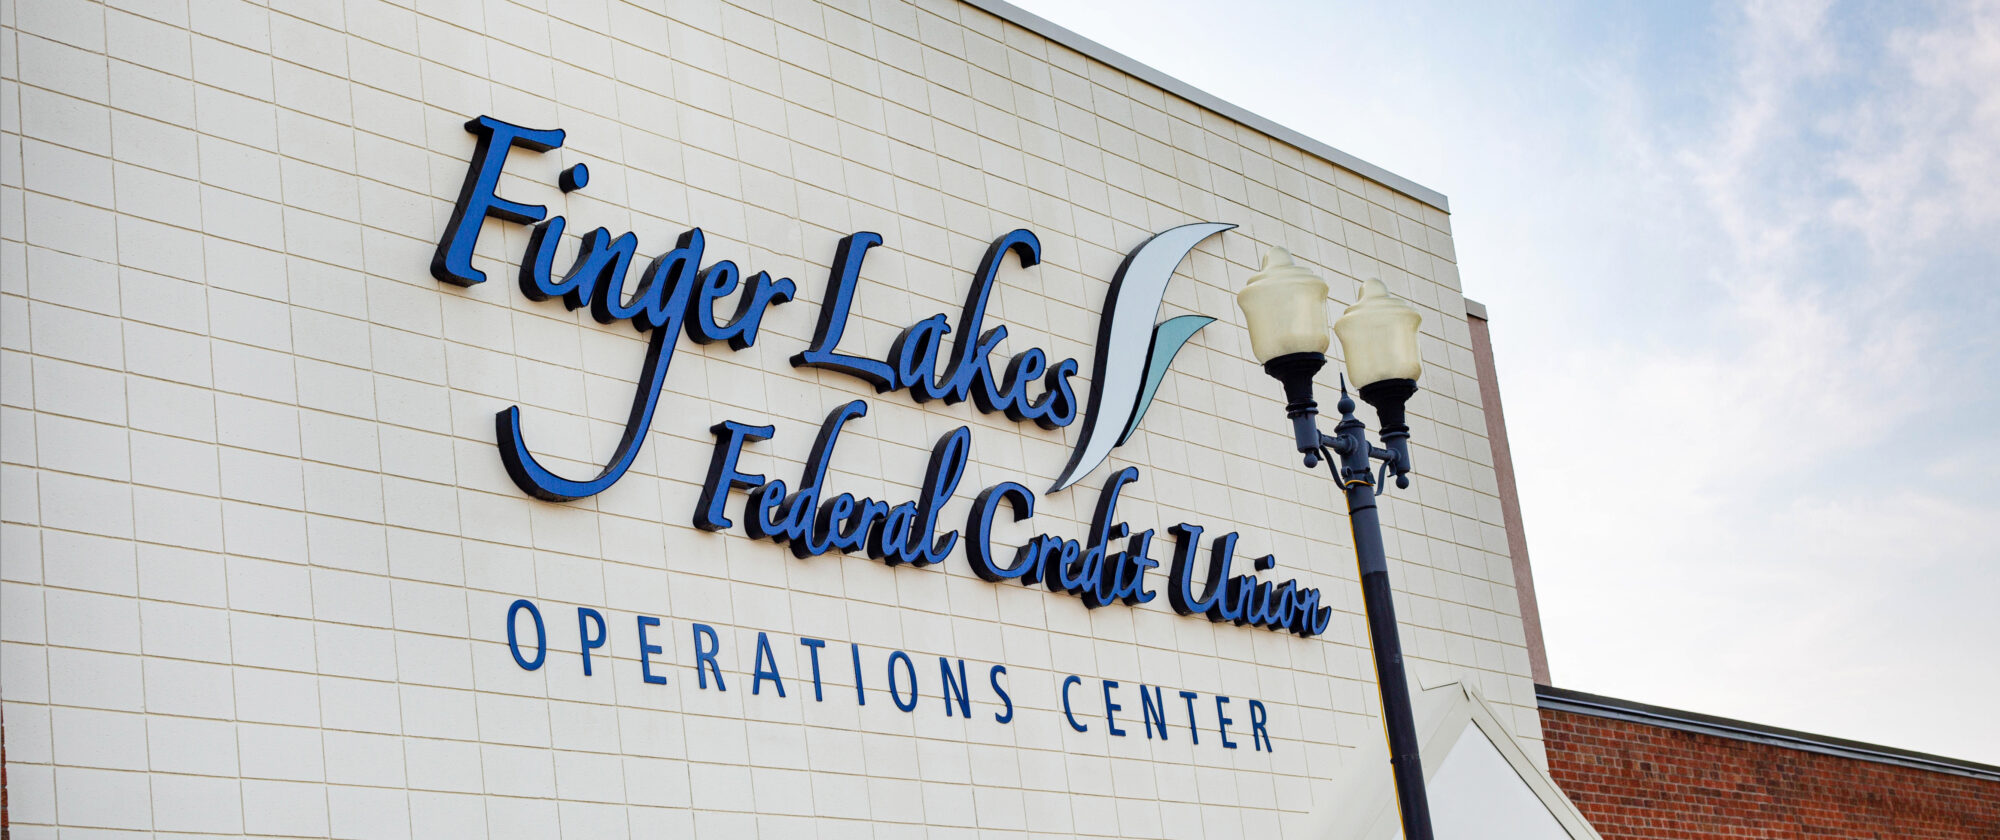 Finger Lakes Federal Credit Union Sign Brand Inhouse Design